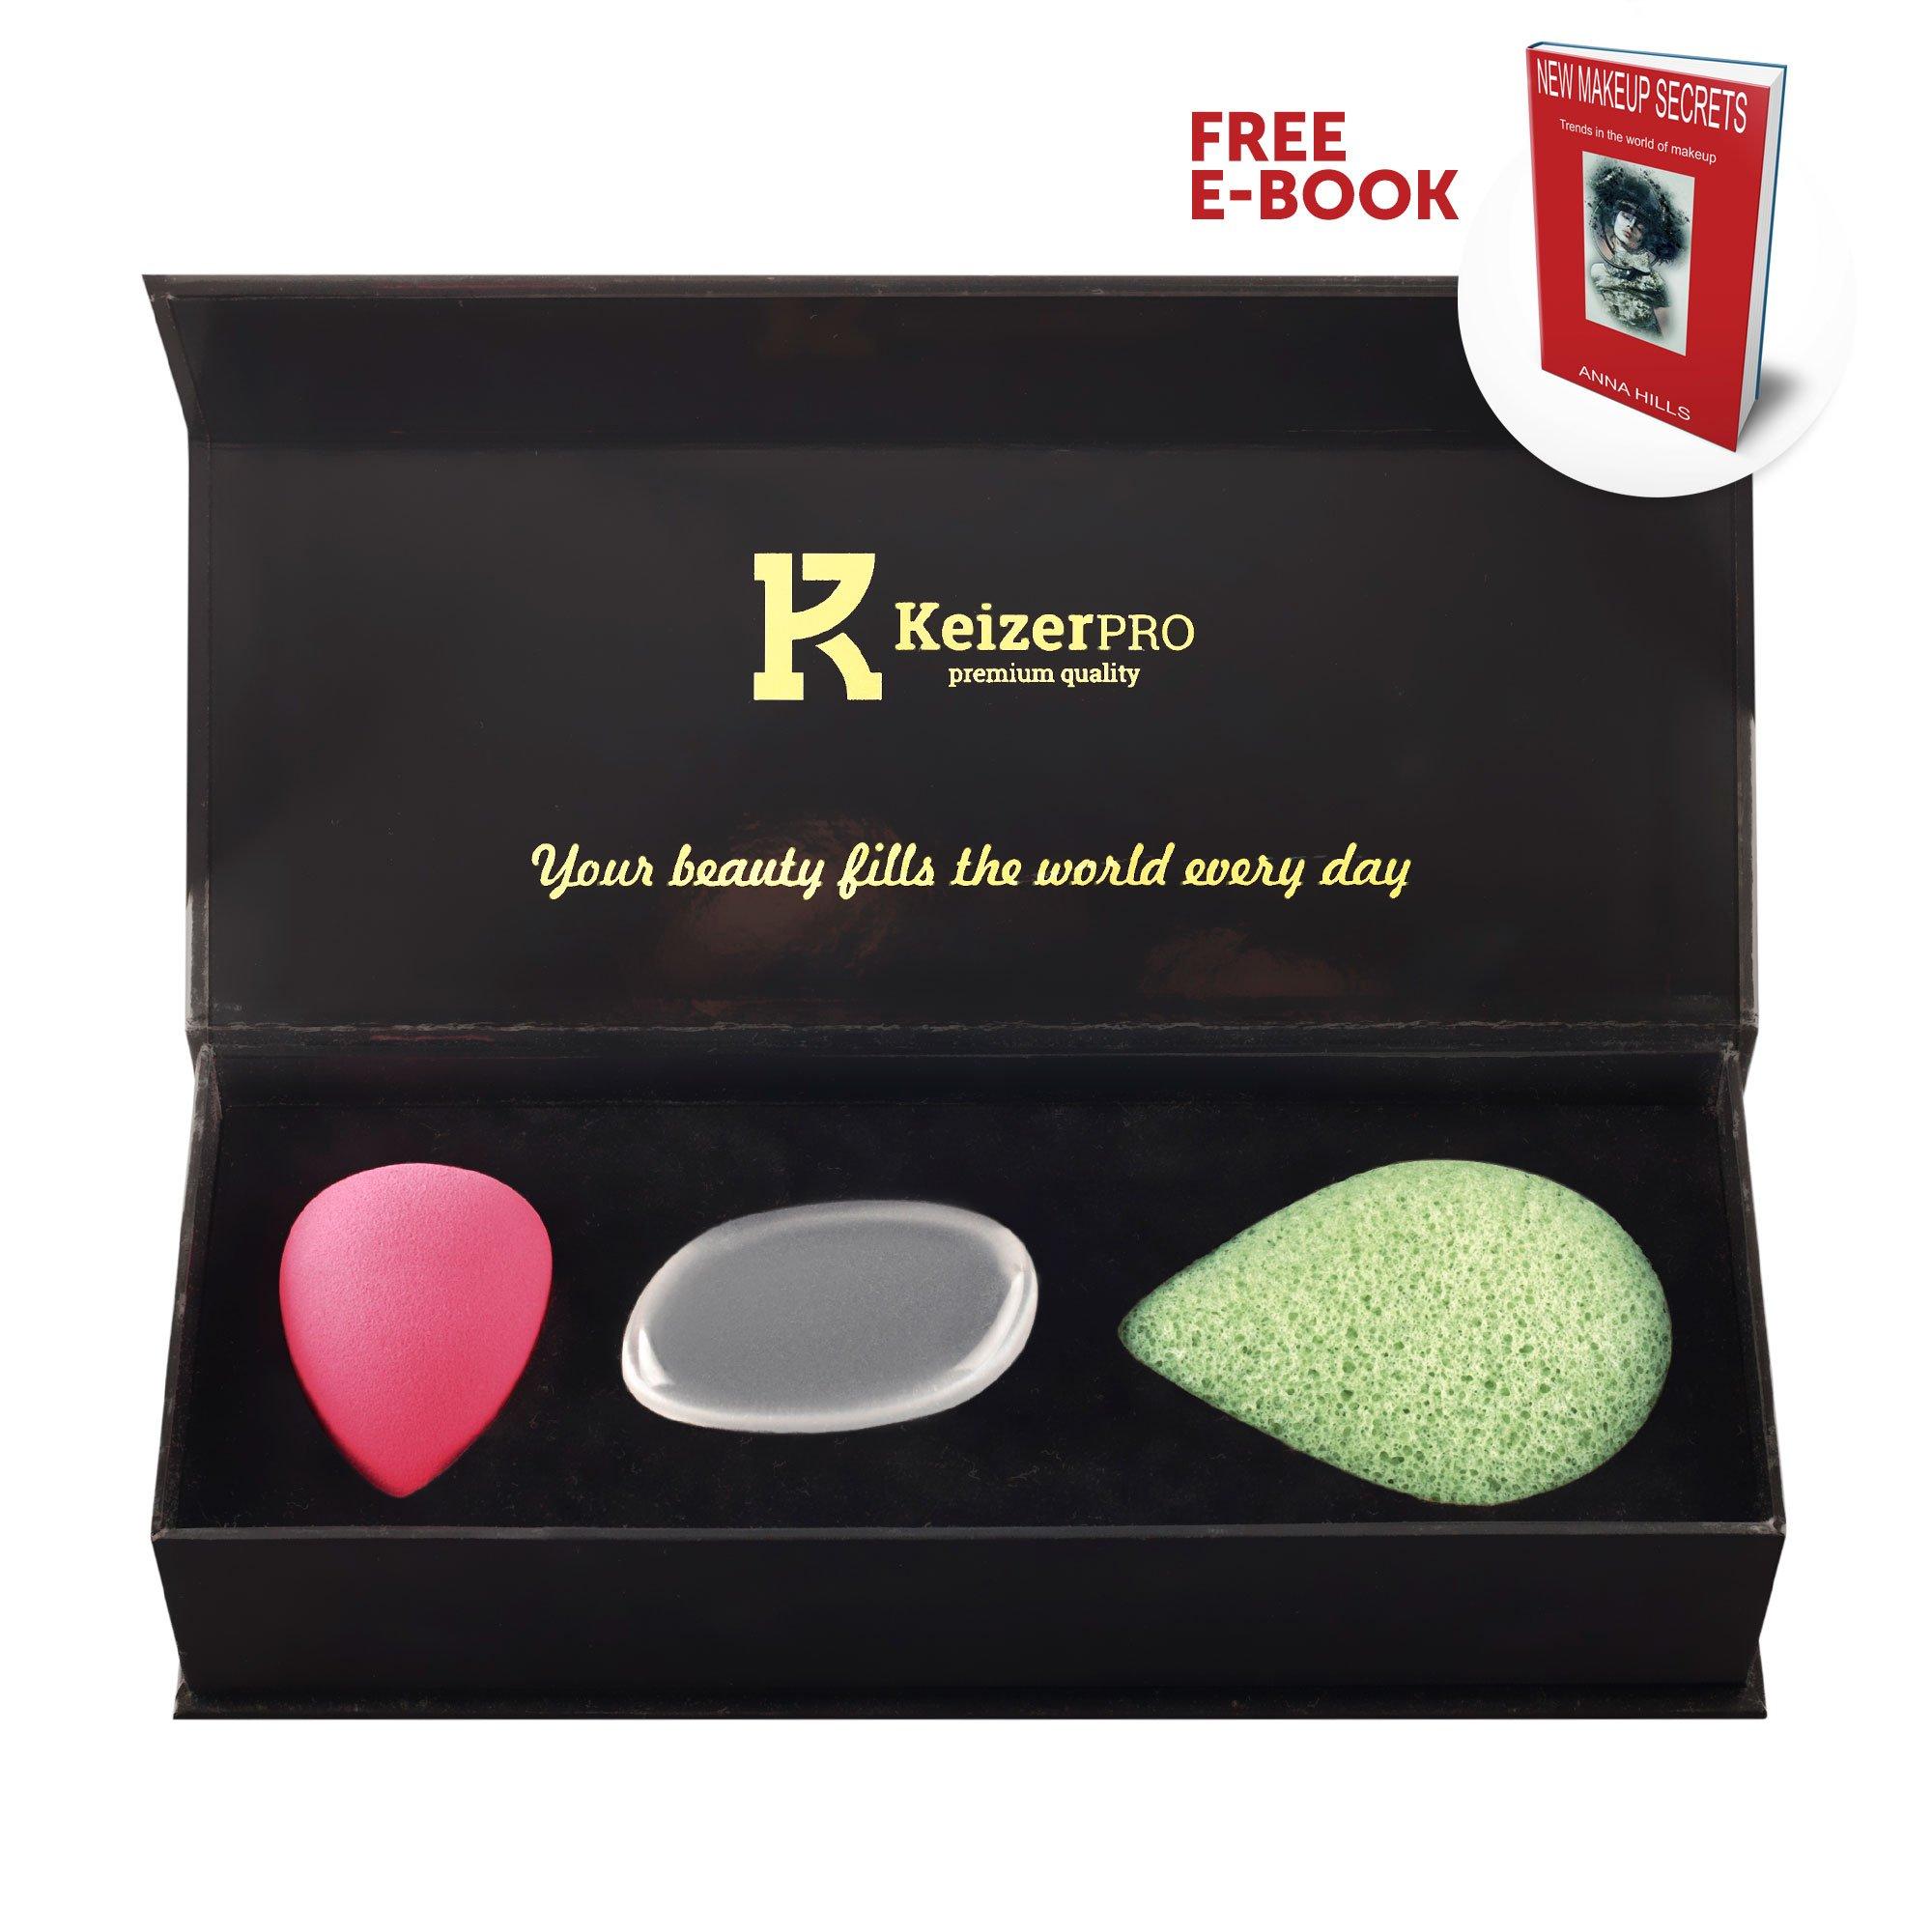 KeizerPro Premium Makeup Sponge Set - 3 in 1 Natural Makeup sponges for Professional Makeup - Konjac Sponge - Silicone Make up Sponge - Makeup Blender - Cosmetic Face Sponge with Gift Box